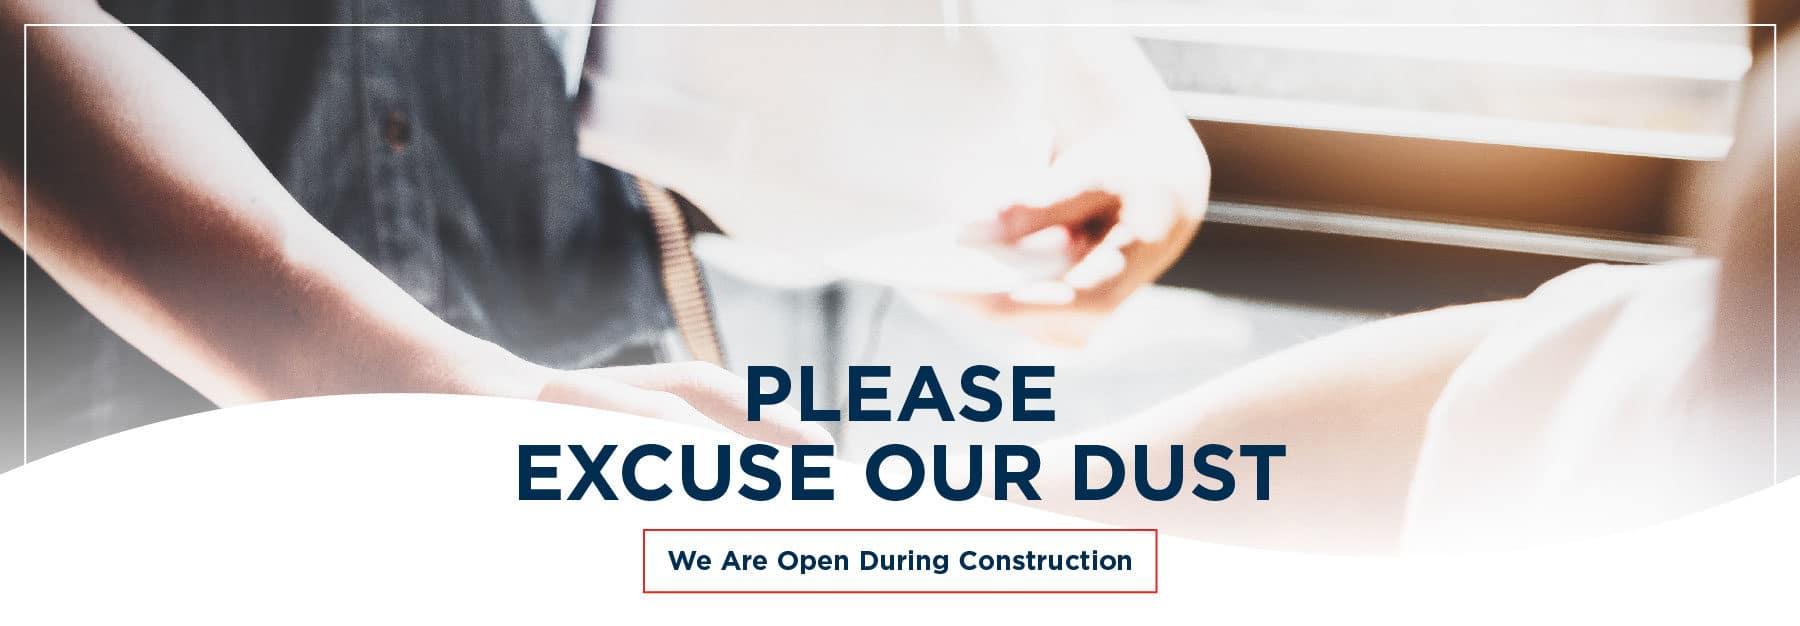 construction_1800x625